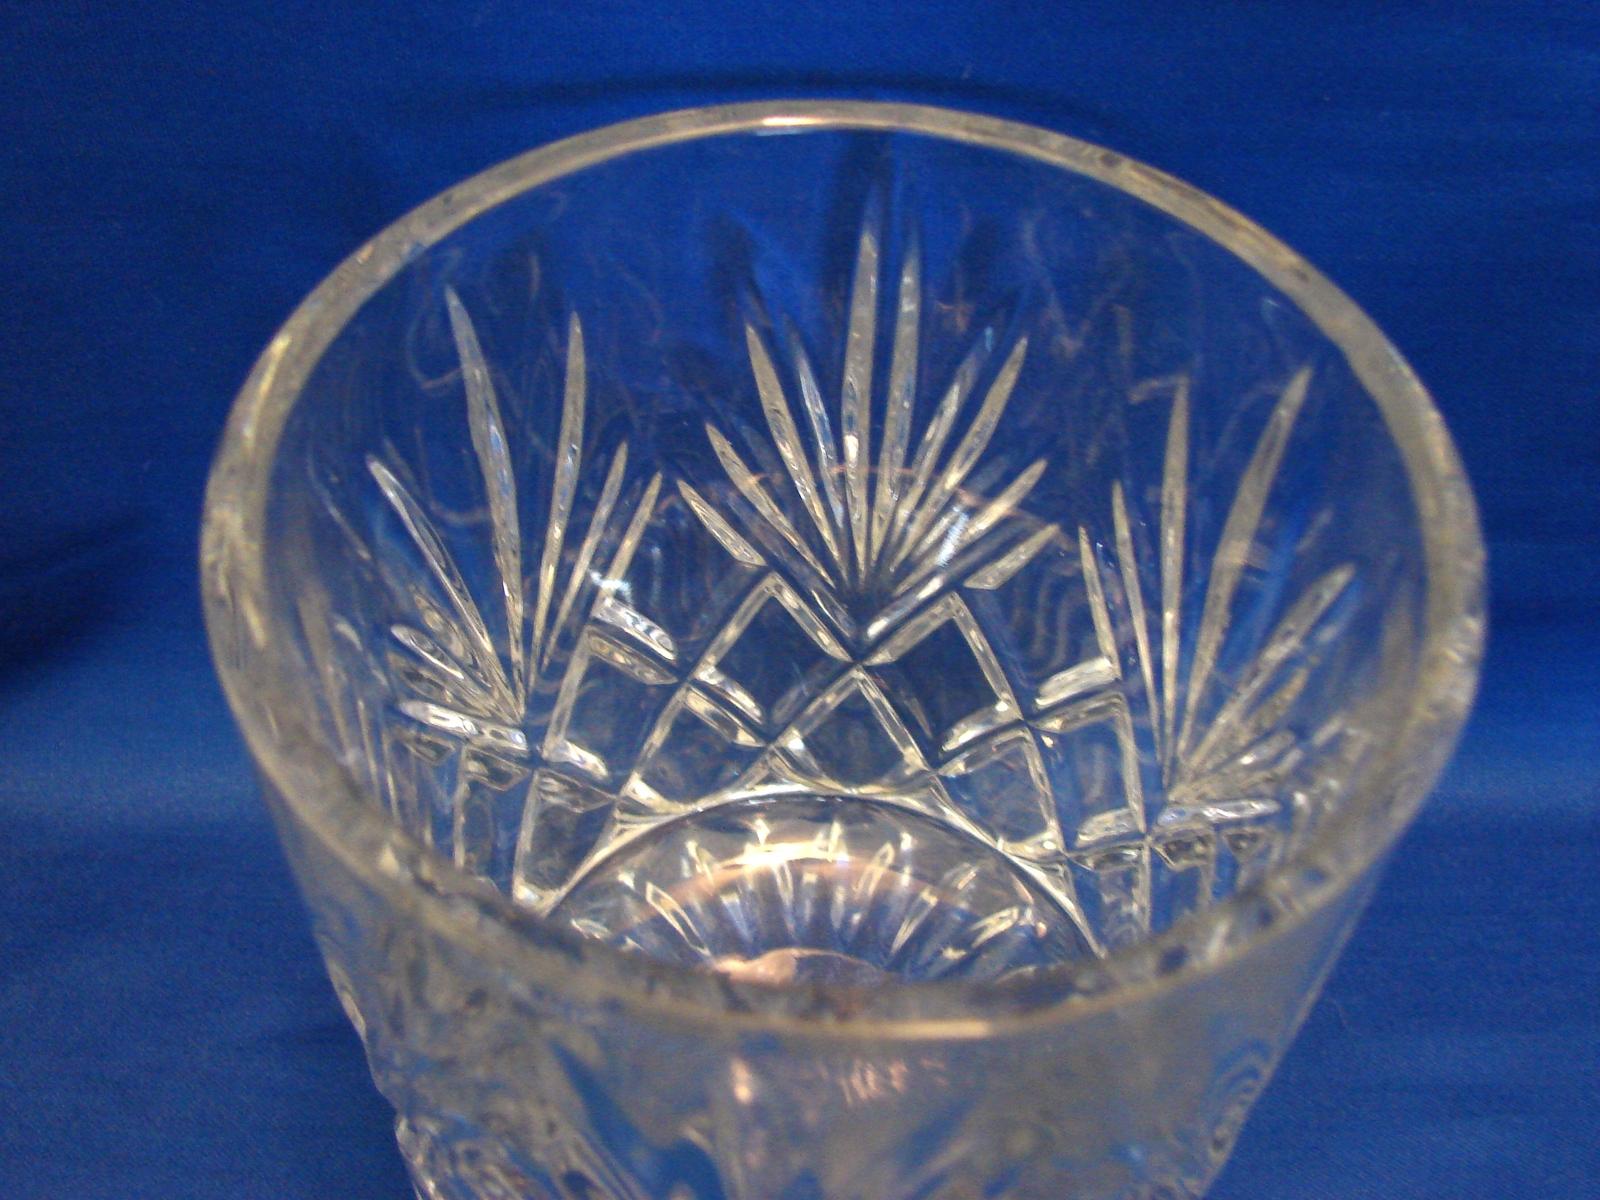 Clear Lead Crystal Biscuit Barrel Lidded Cookie Jar Canister Diamond & Fan